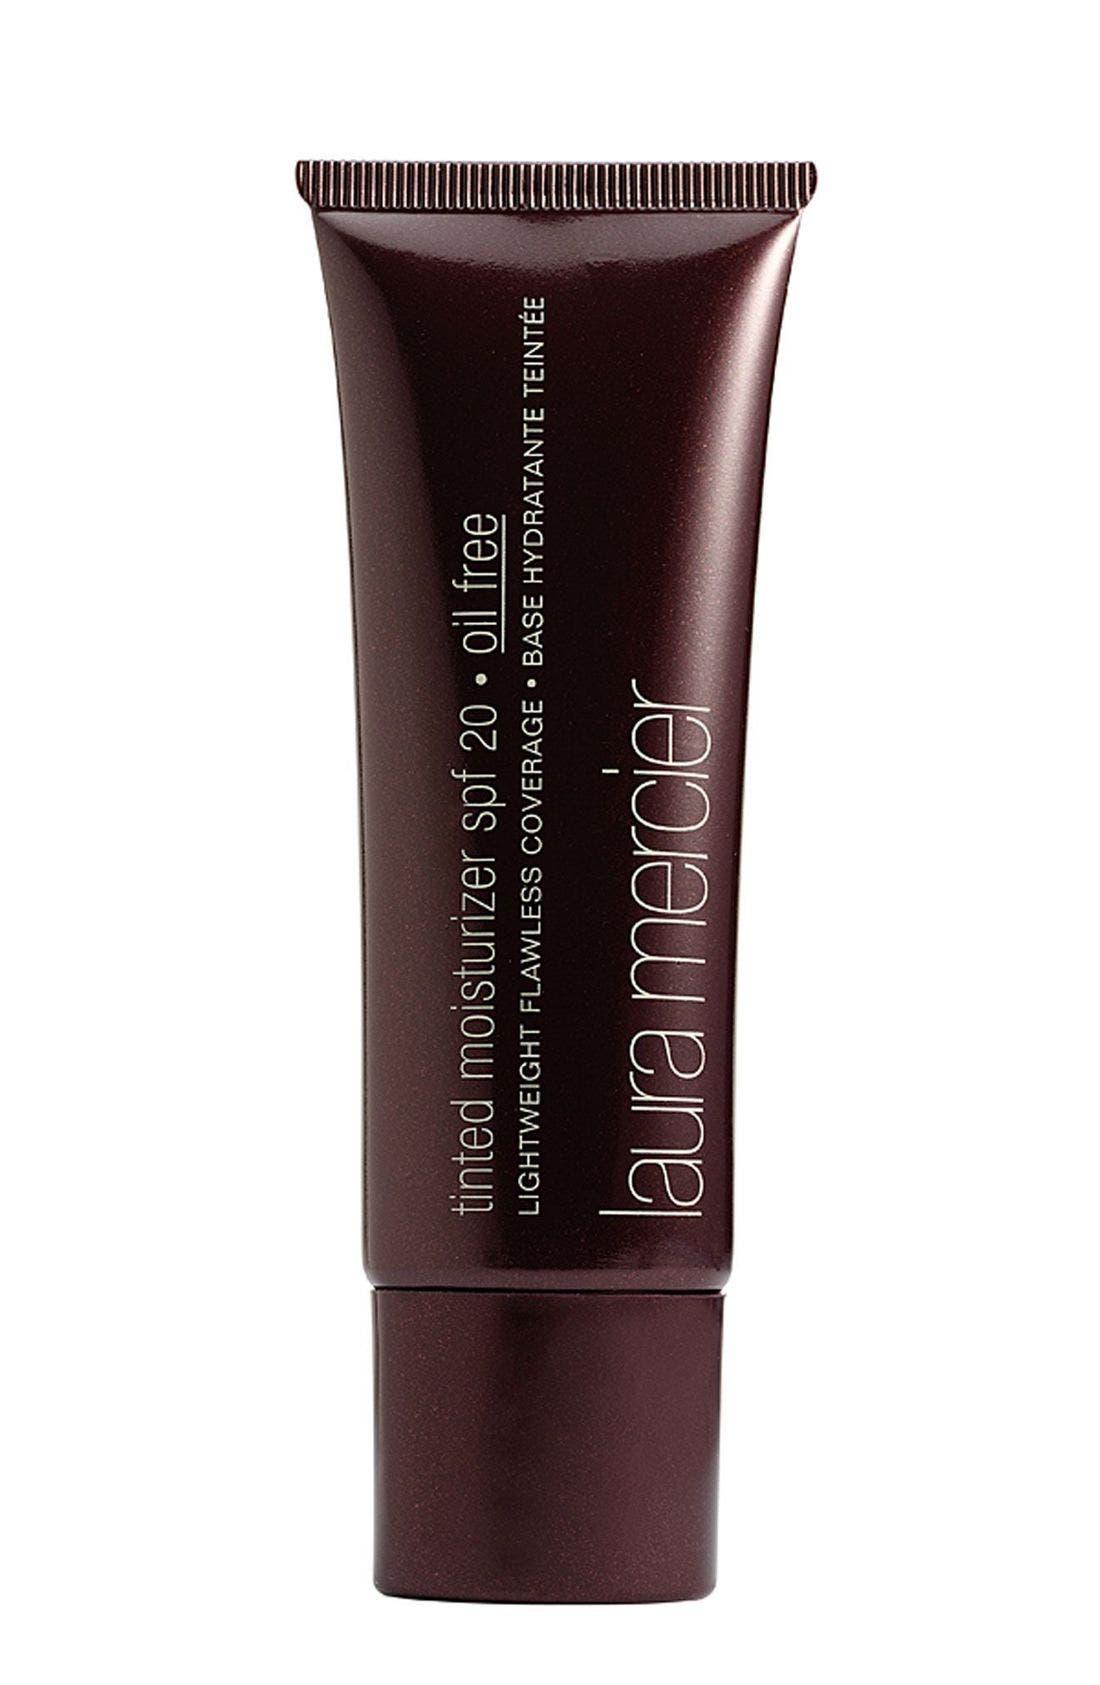 Laura Mercier Oil-Free Tinted Moisturizer Broad Spectrum SPF 20 Sunscreen